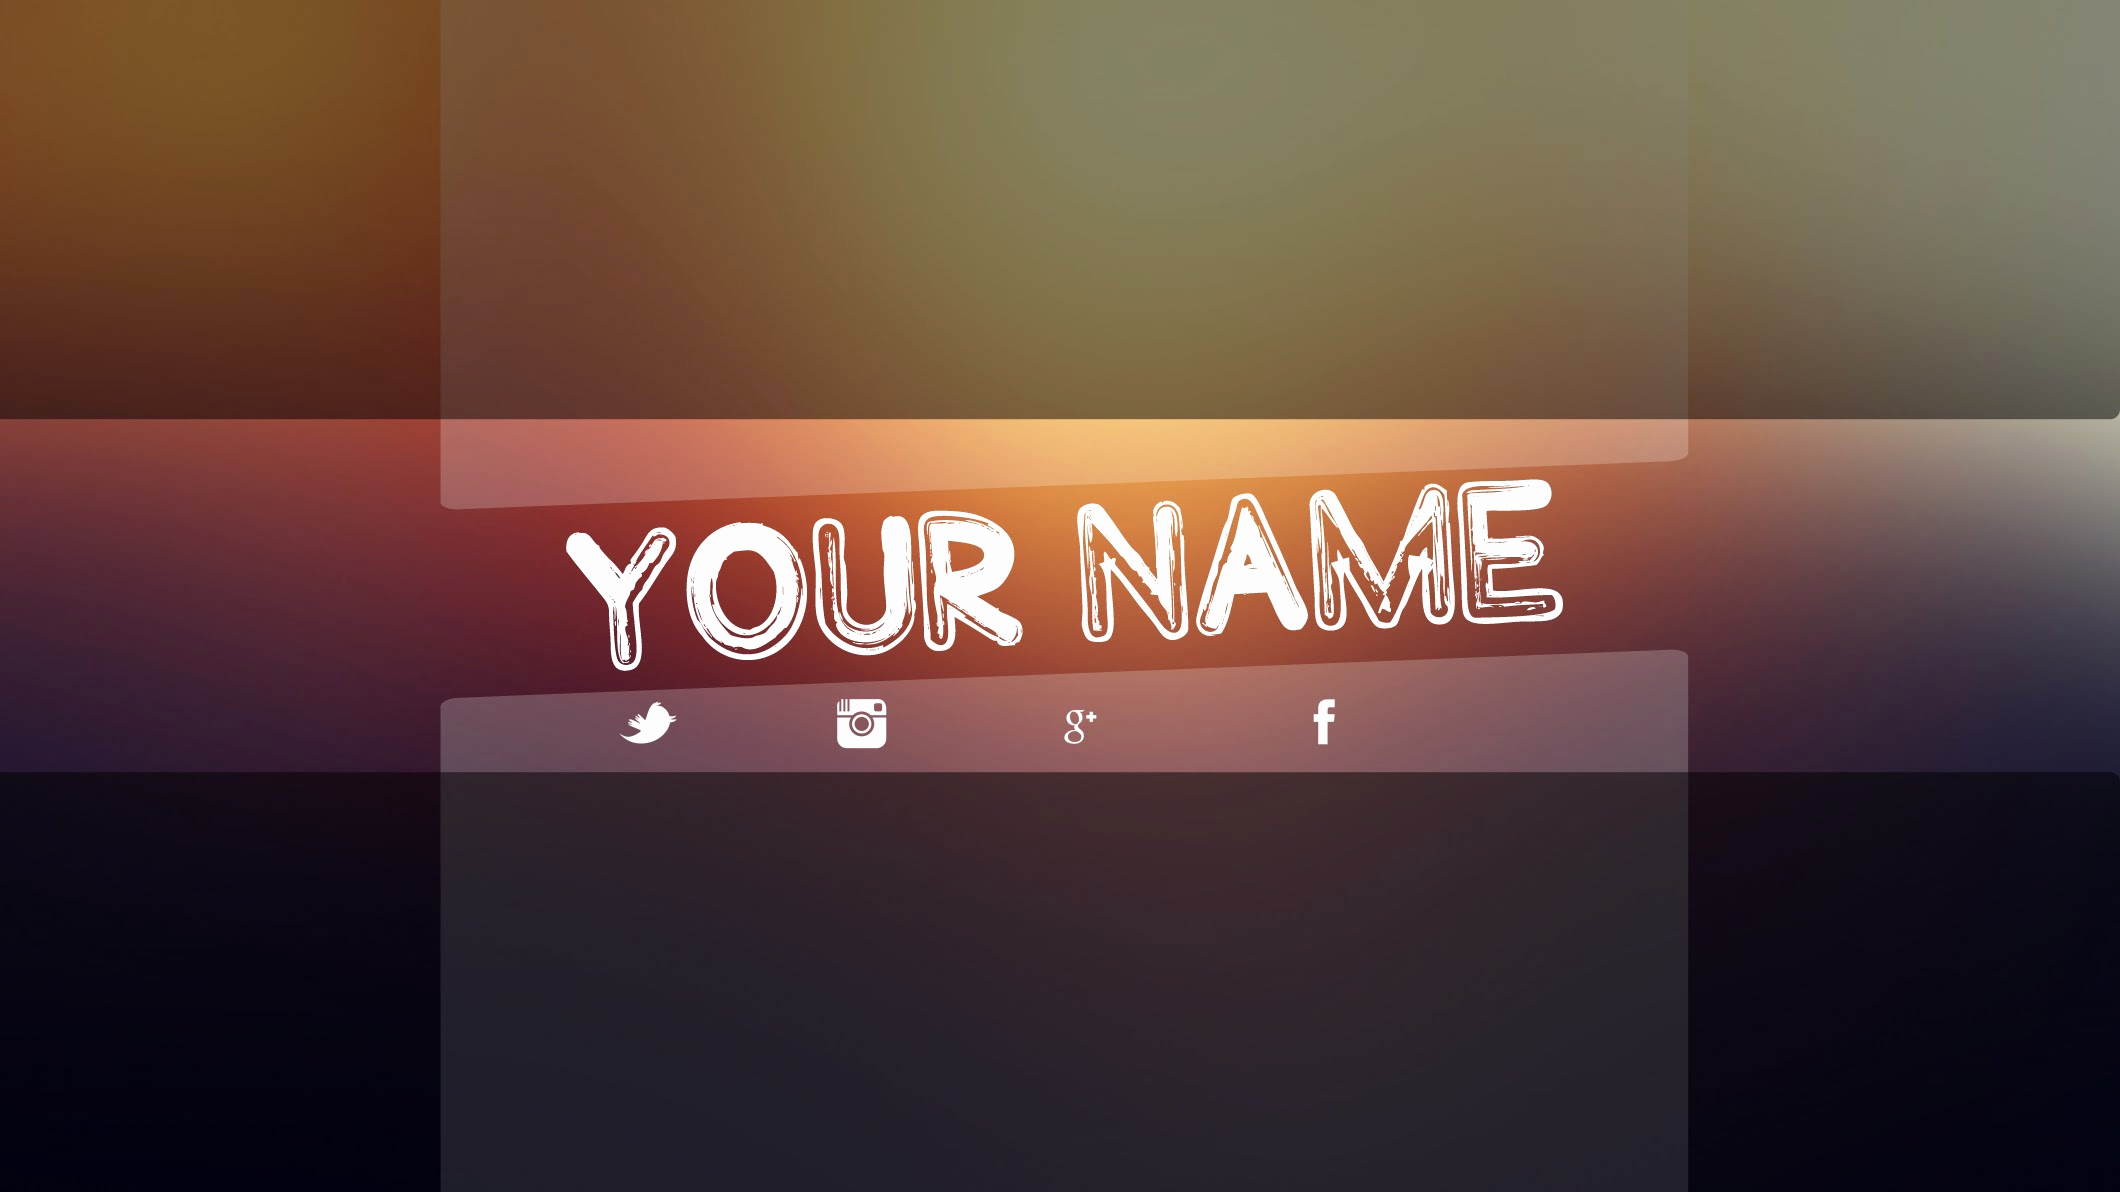 Youtube Banner Template Photoshop Luxury Youtube Banner Template Psd